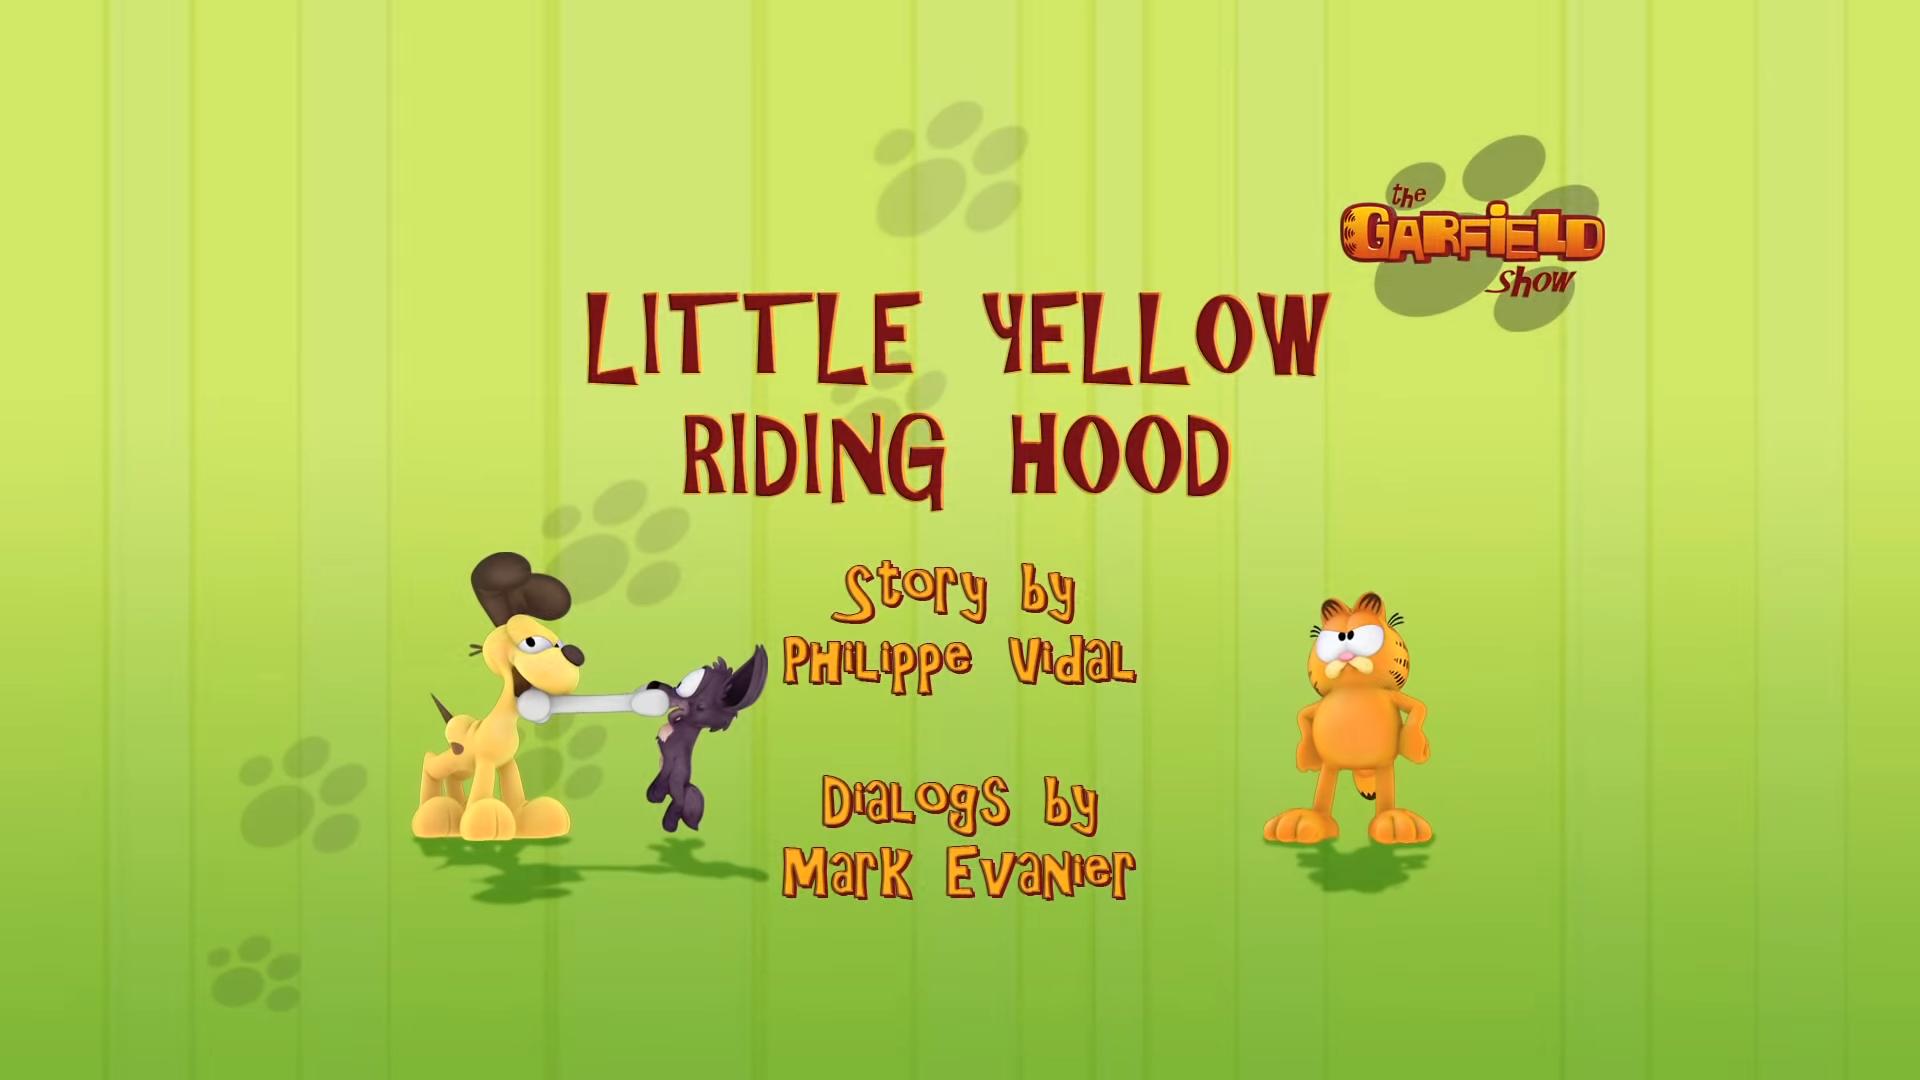 Little Yellow Riding Hood